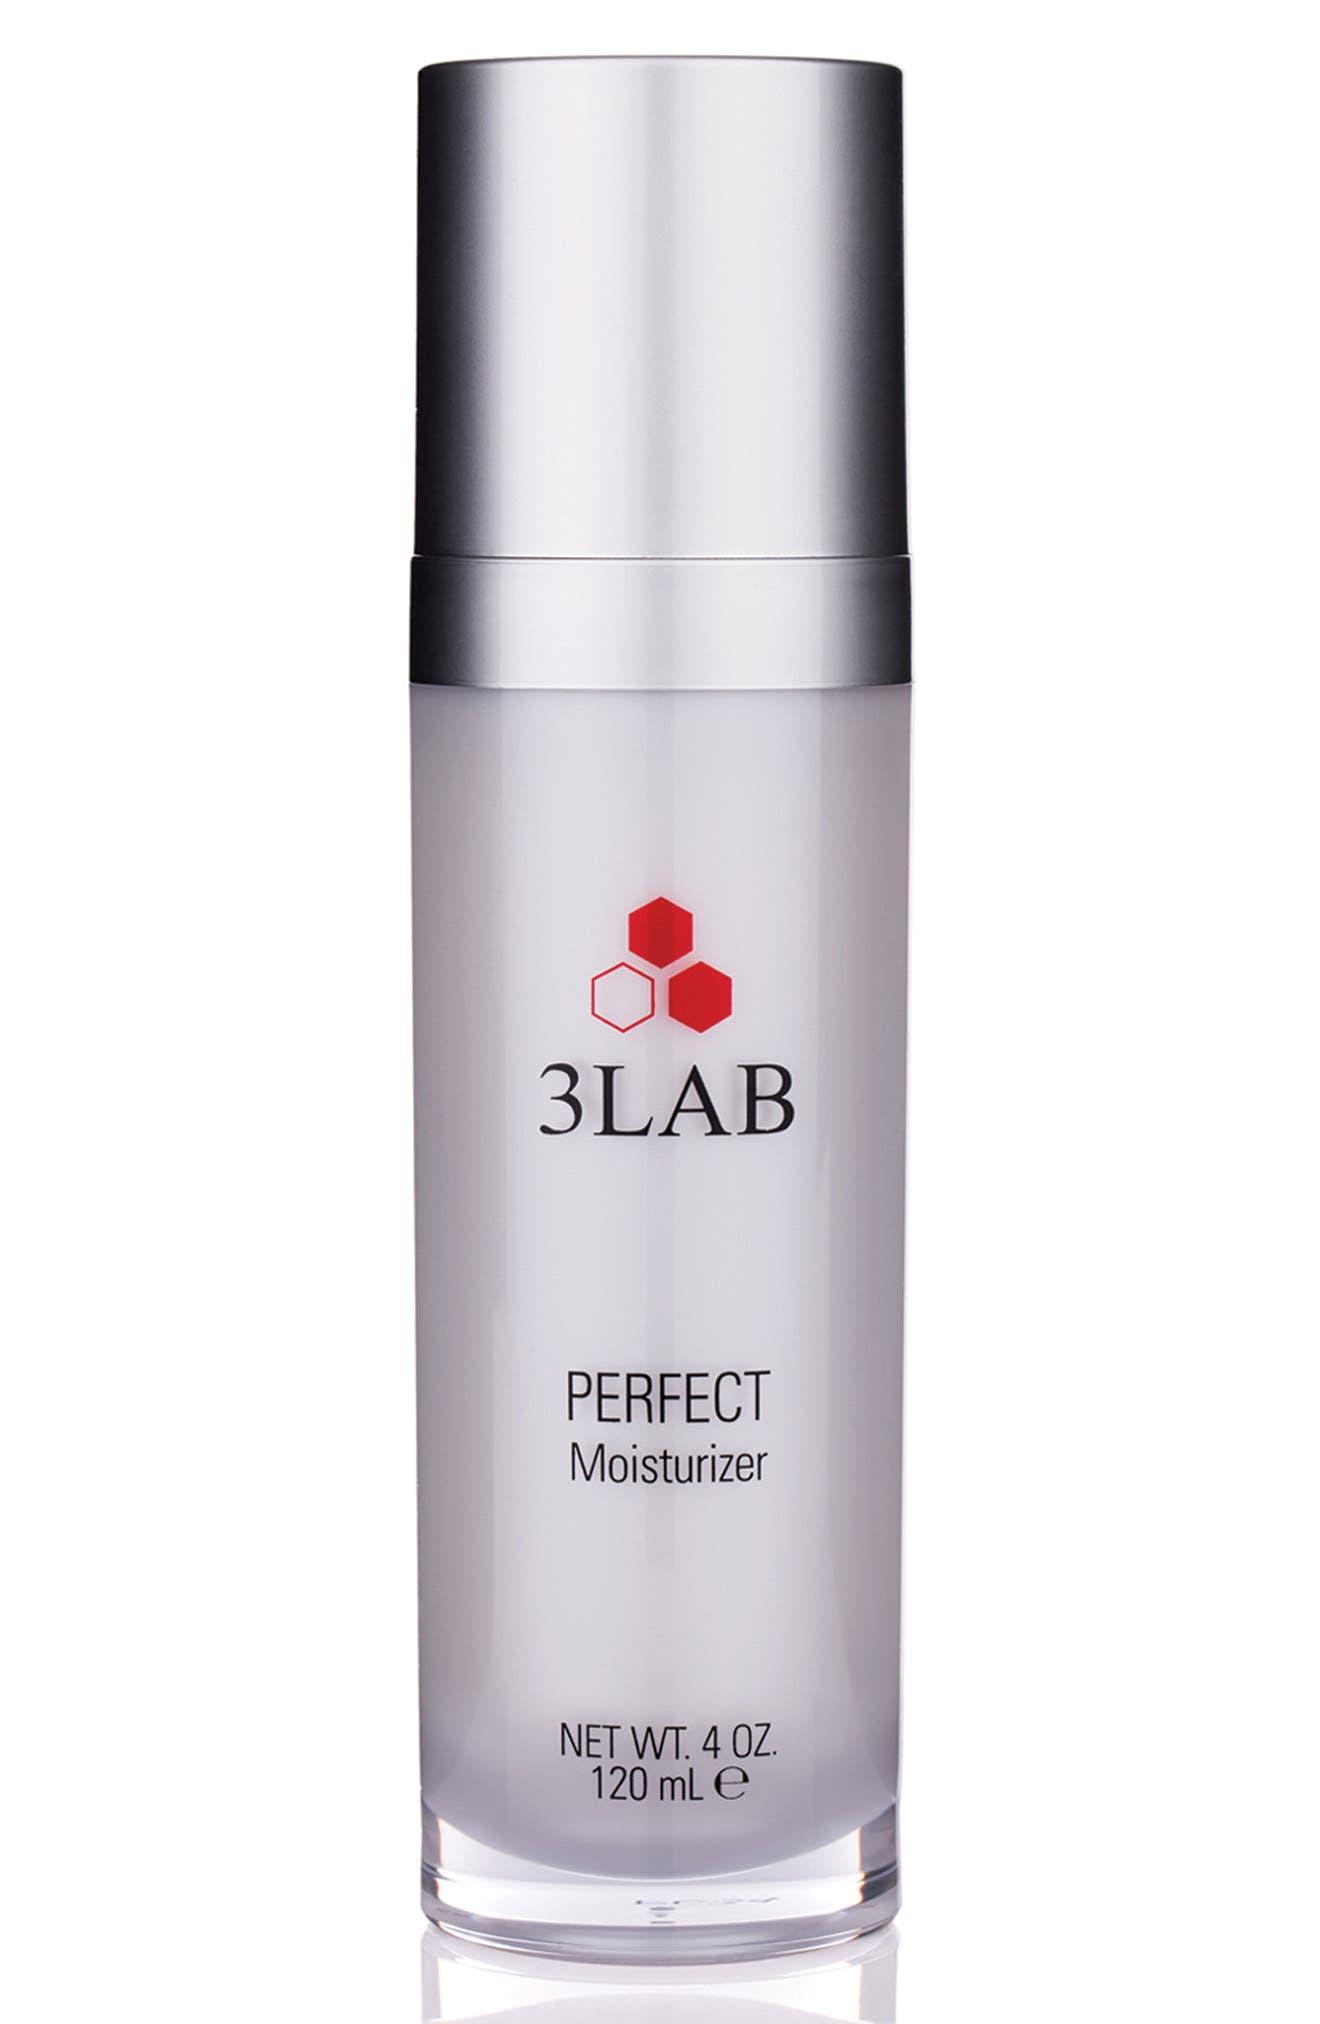 3LAB Perfect Moisturizer